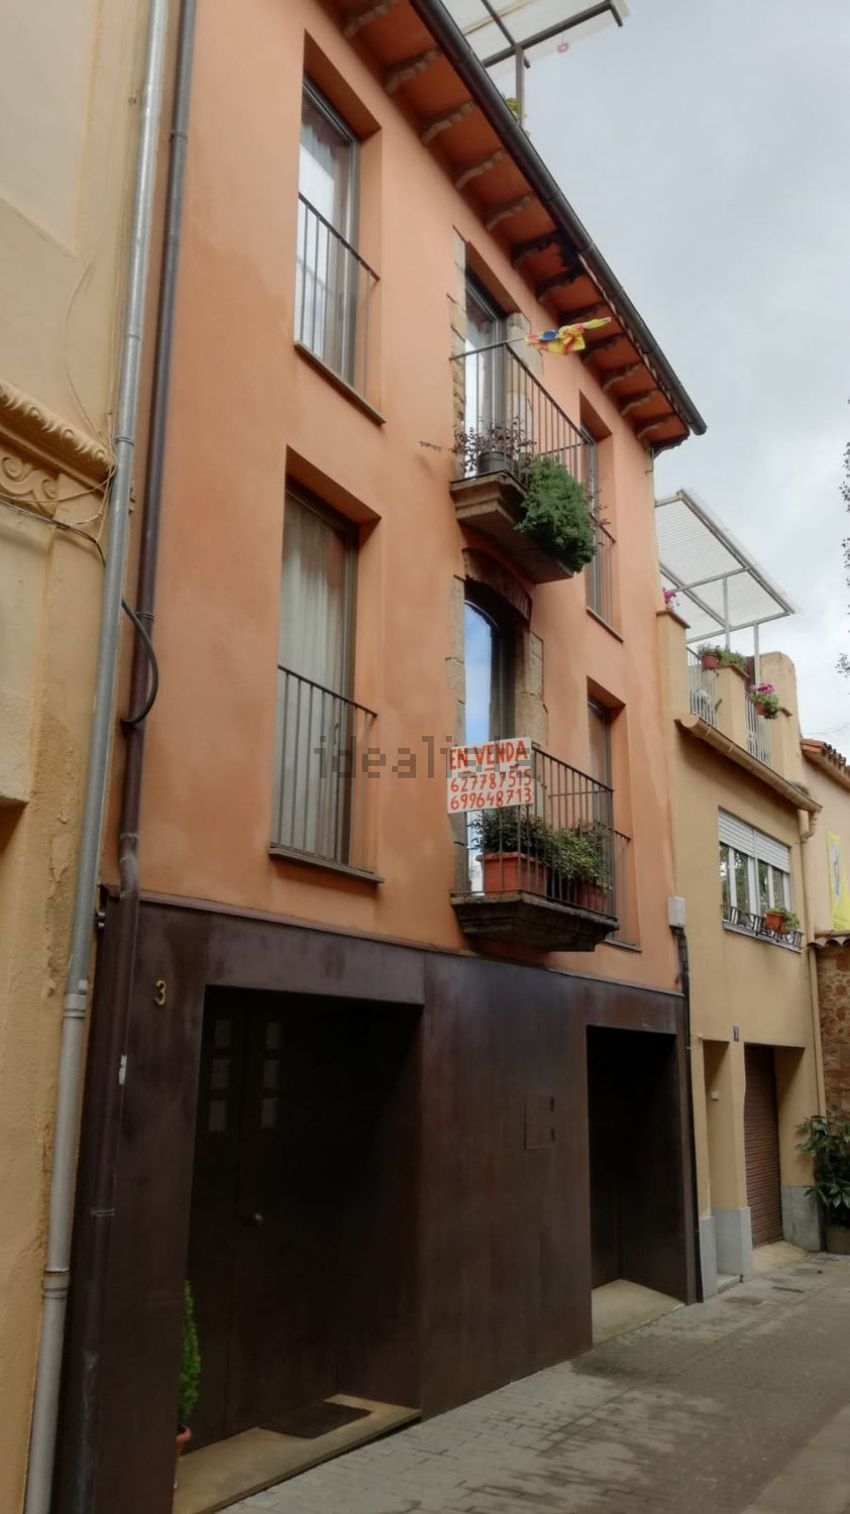 Casa de pueblo en calle Rovira, 3, Sant Hilari Sacalm